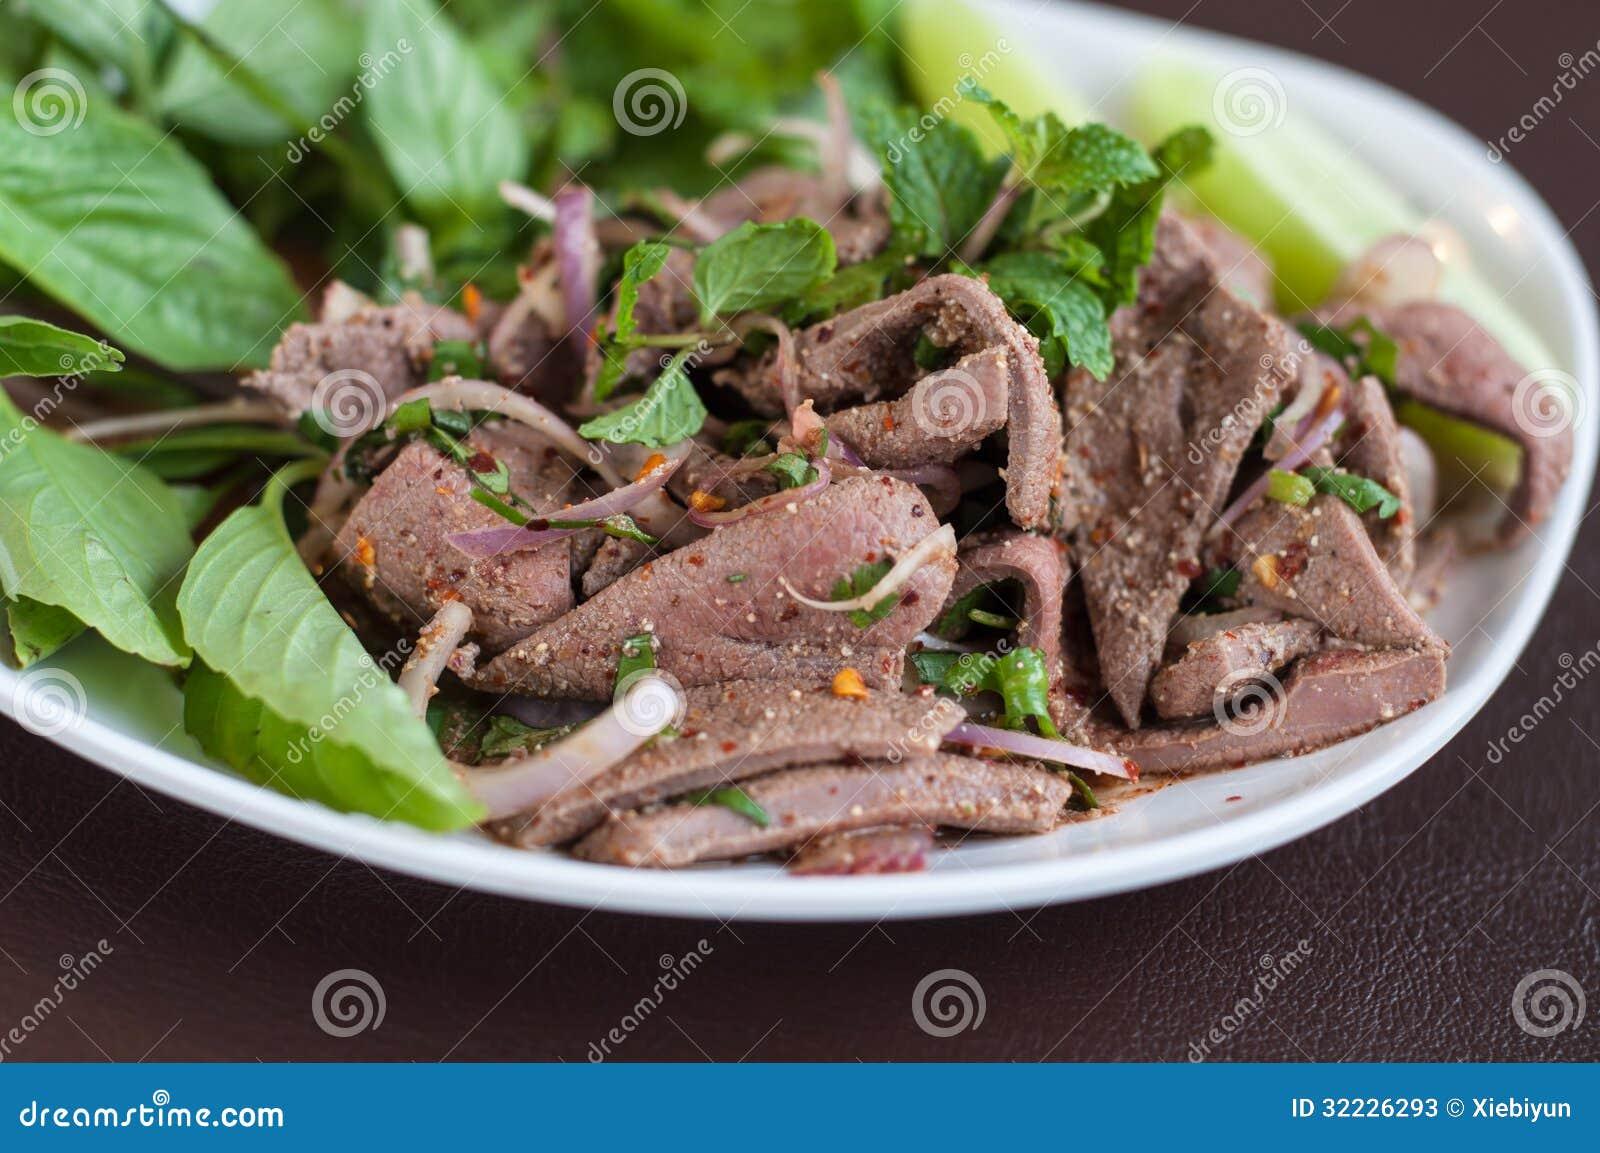 Marketing plan for wan thai food